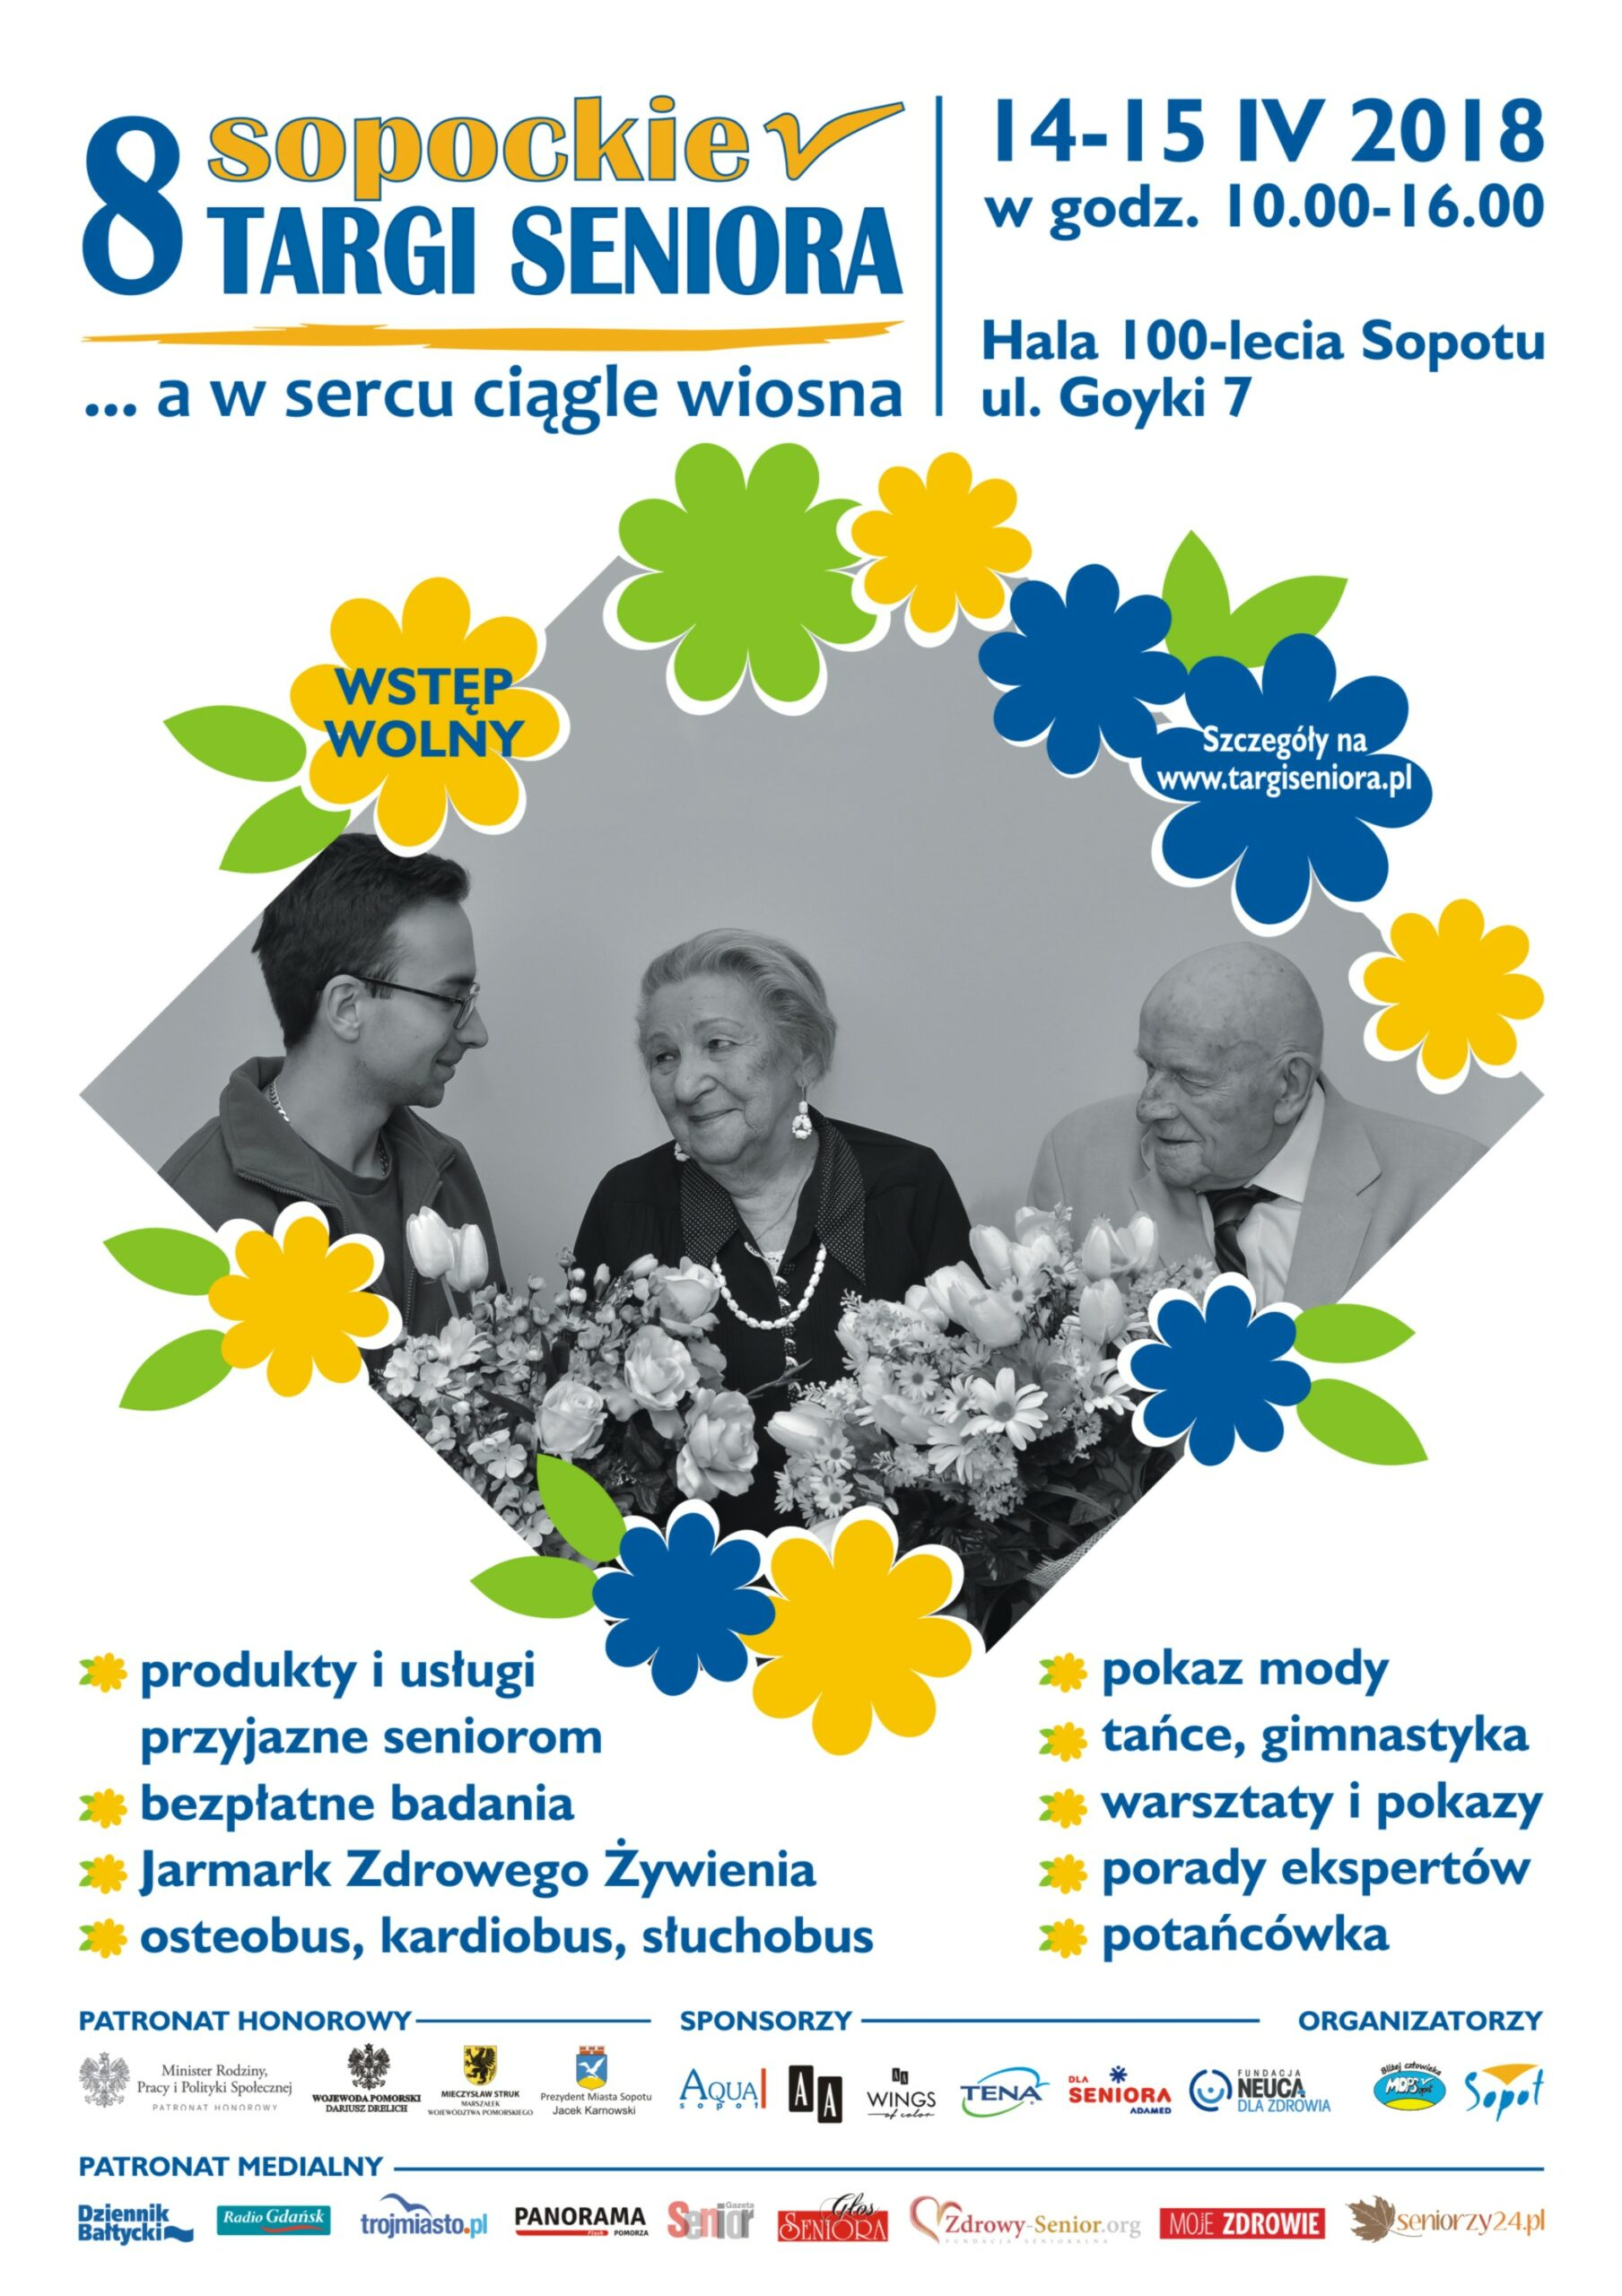 Spotkajmy się na Sopockich Targach Seniora